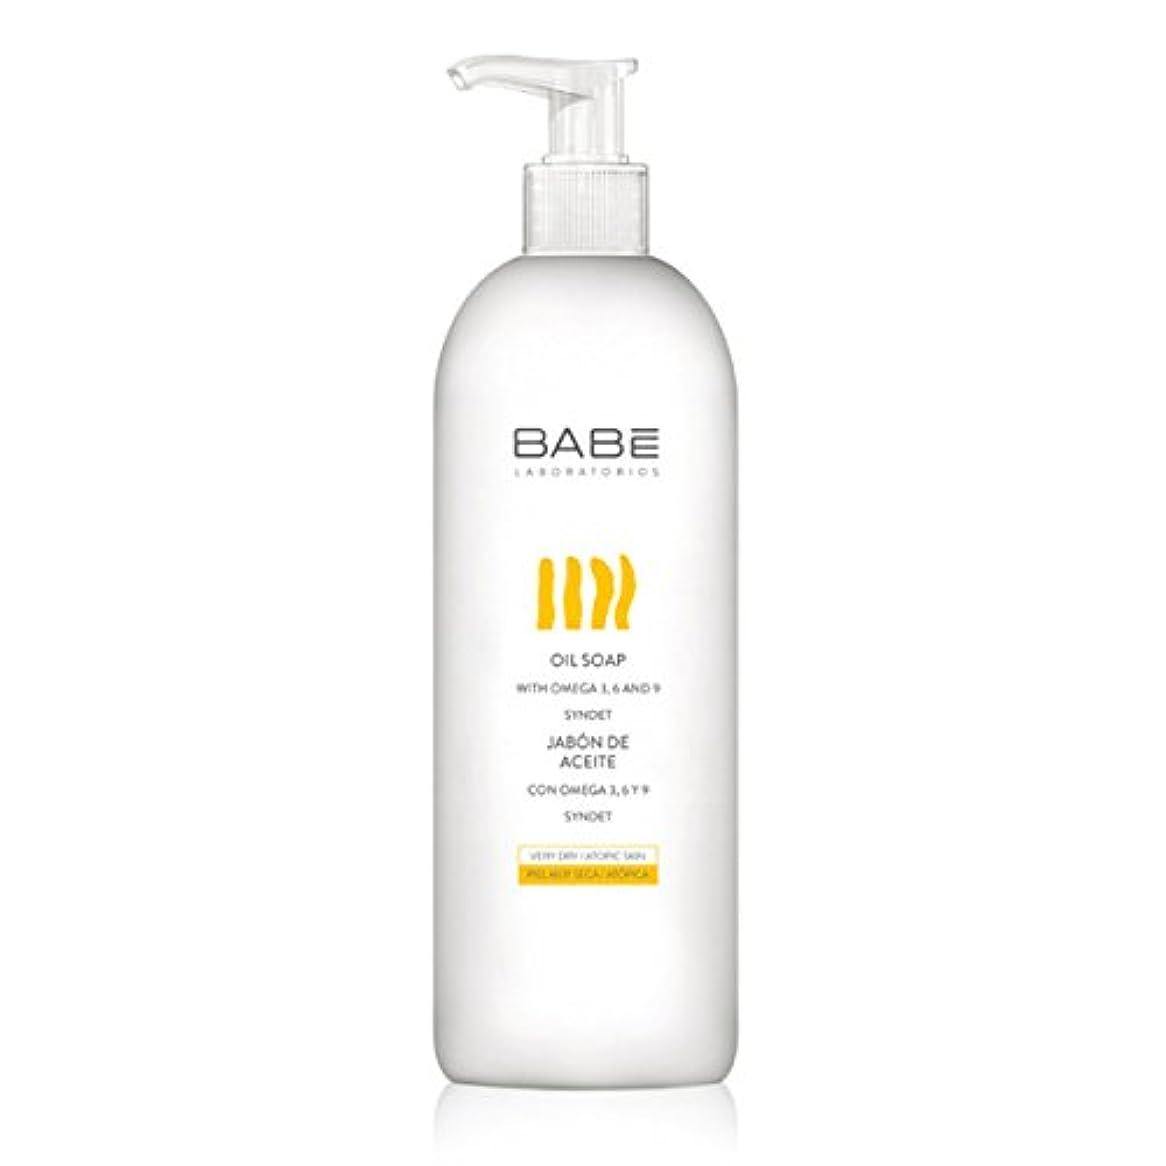 同意奨励ケイ素Babe Bath Oil 500ml [並行輸入品]